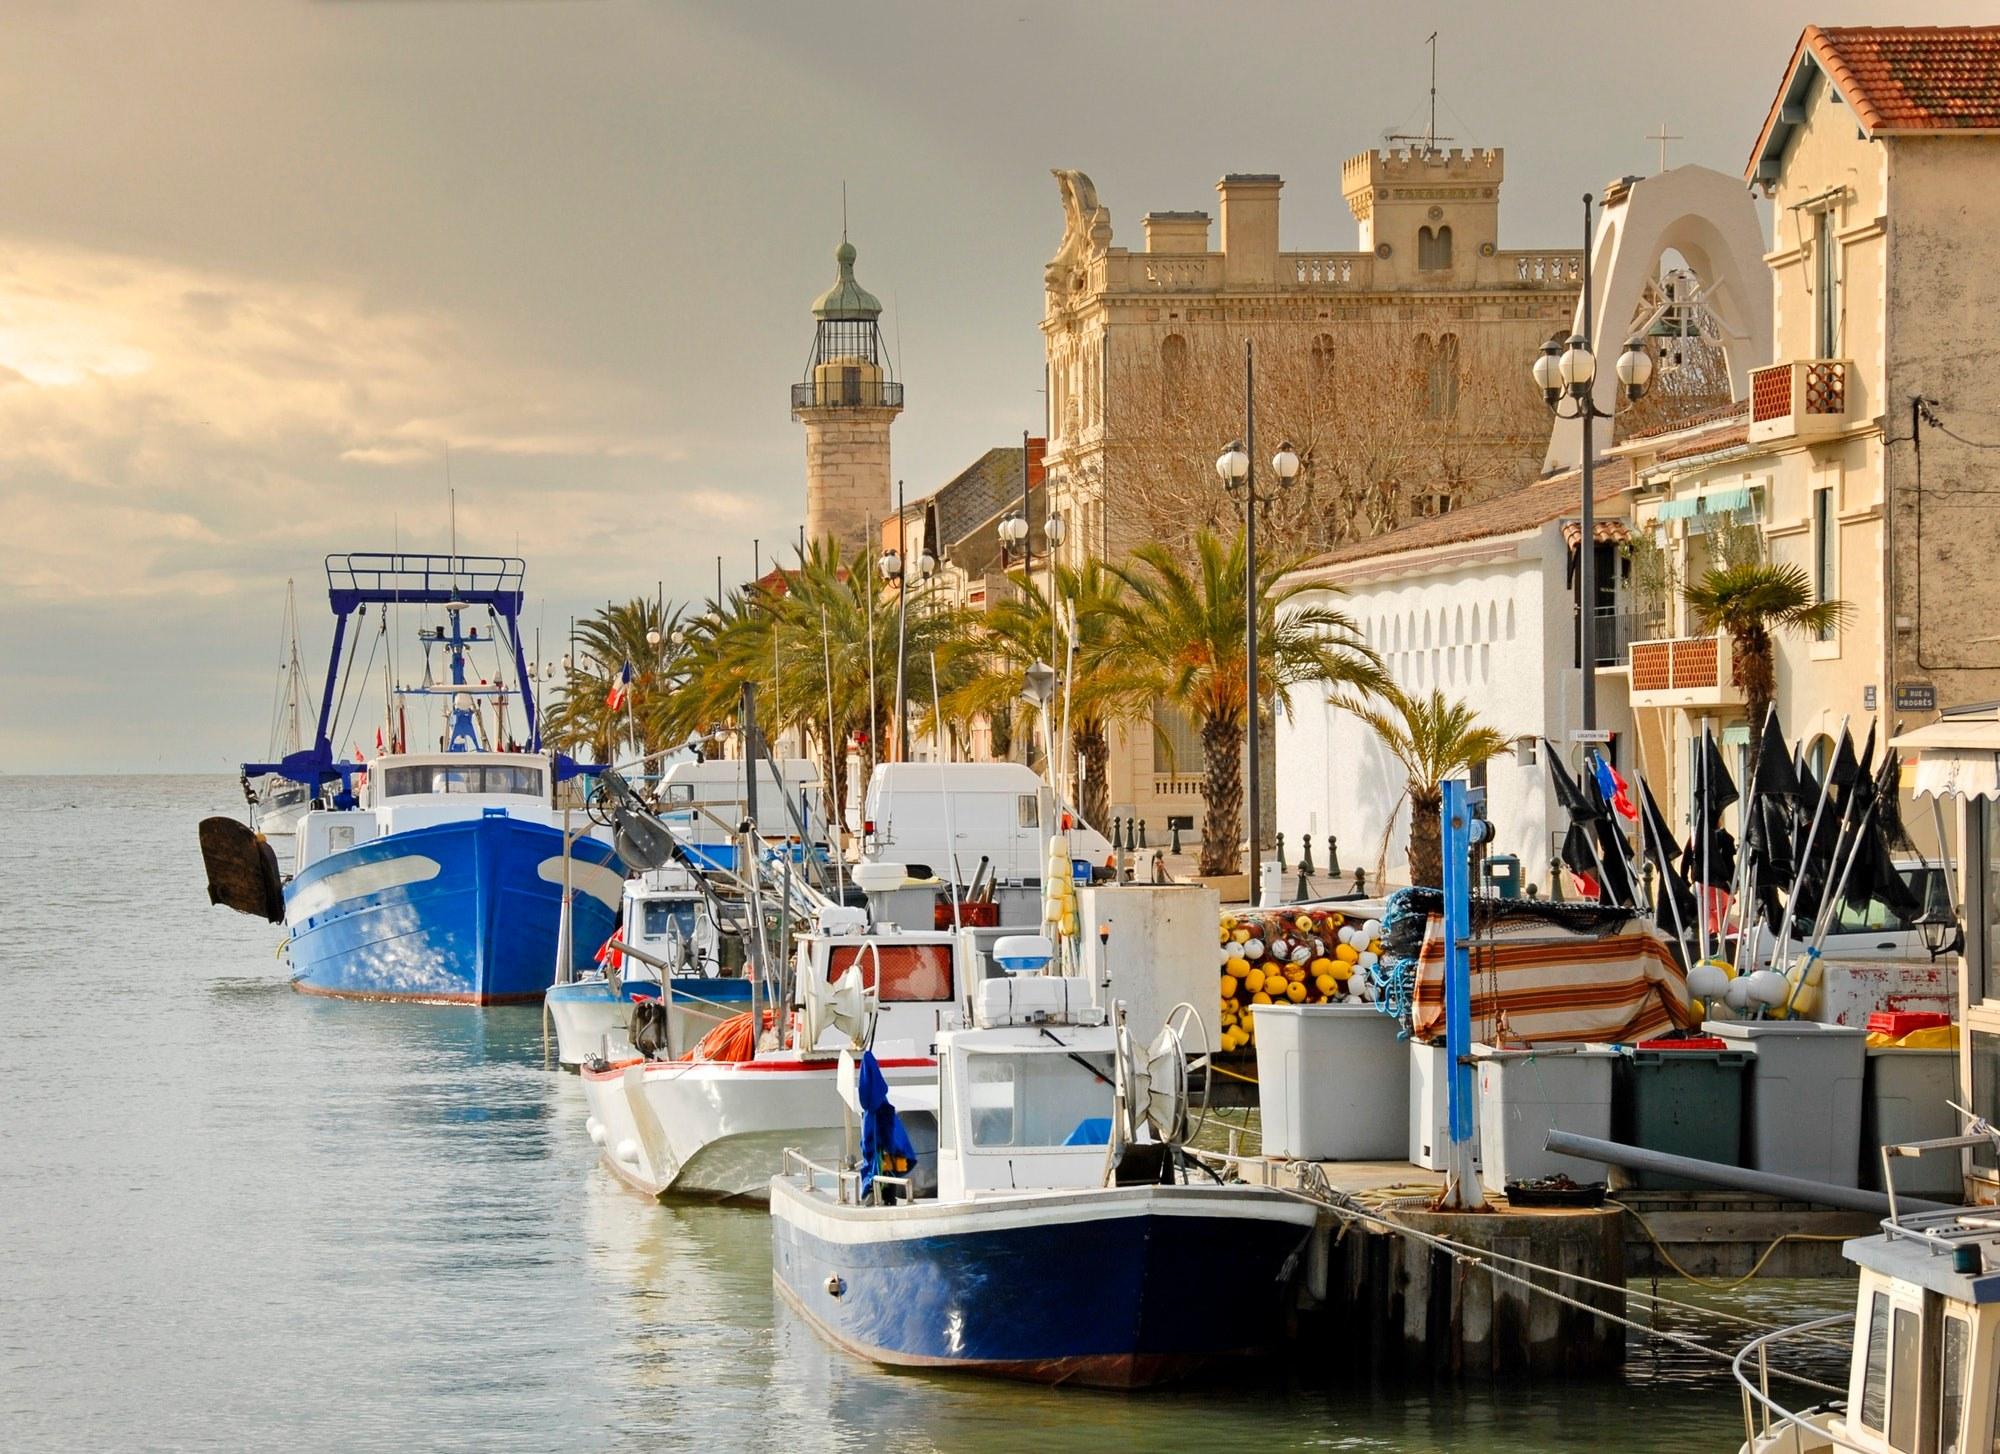 Grau-du-Roi Port-Camargue | Visiter Provence France | Blog & guide de voyage